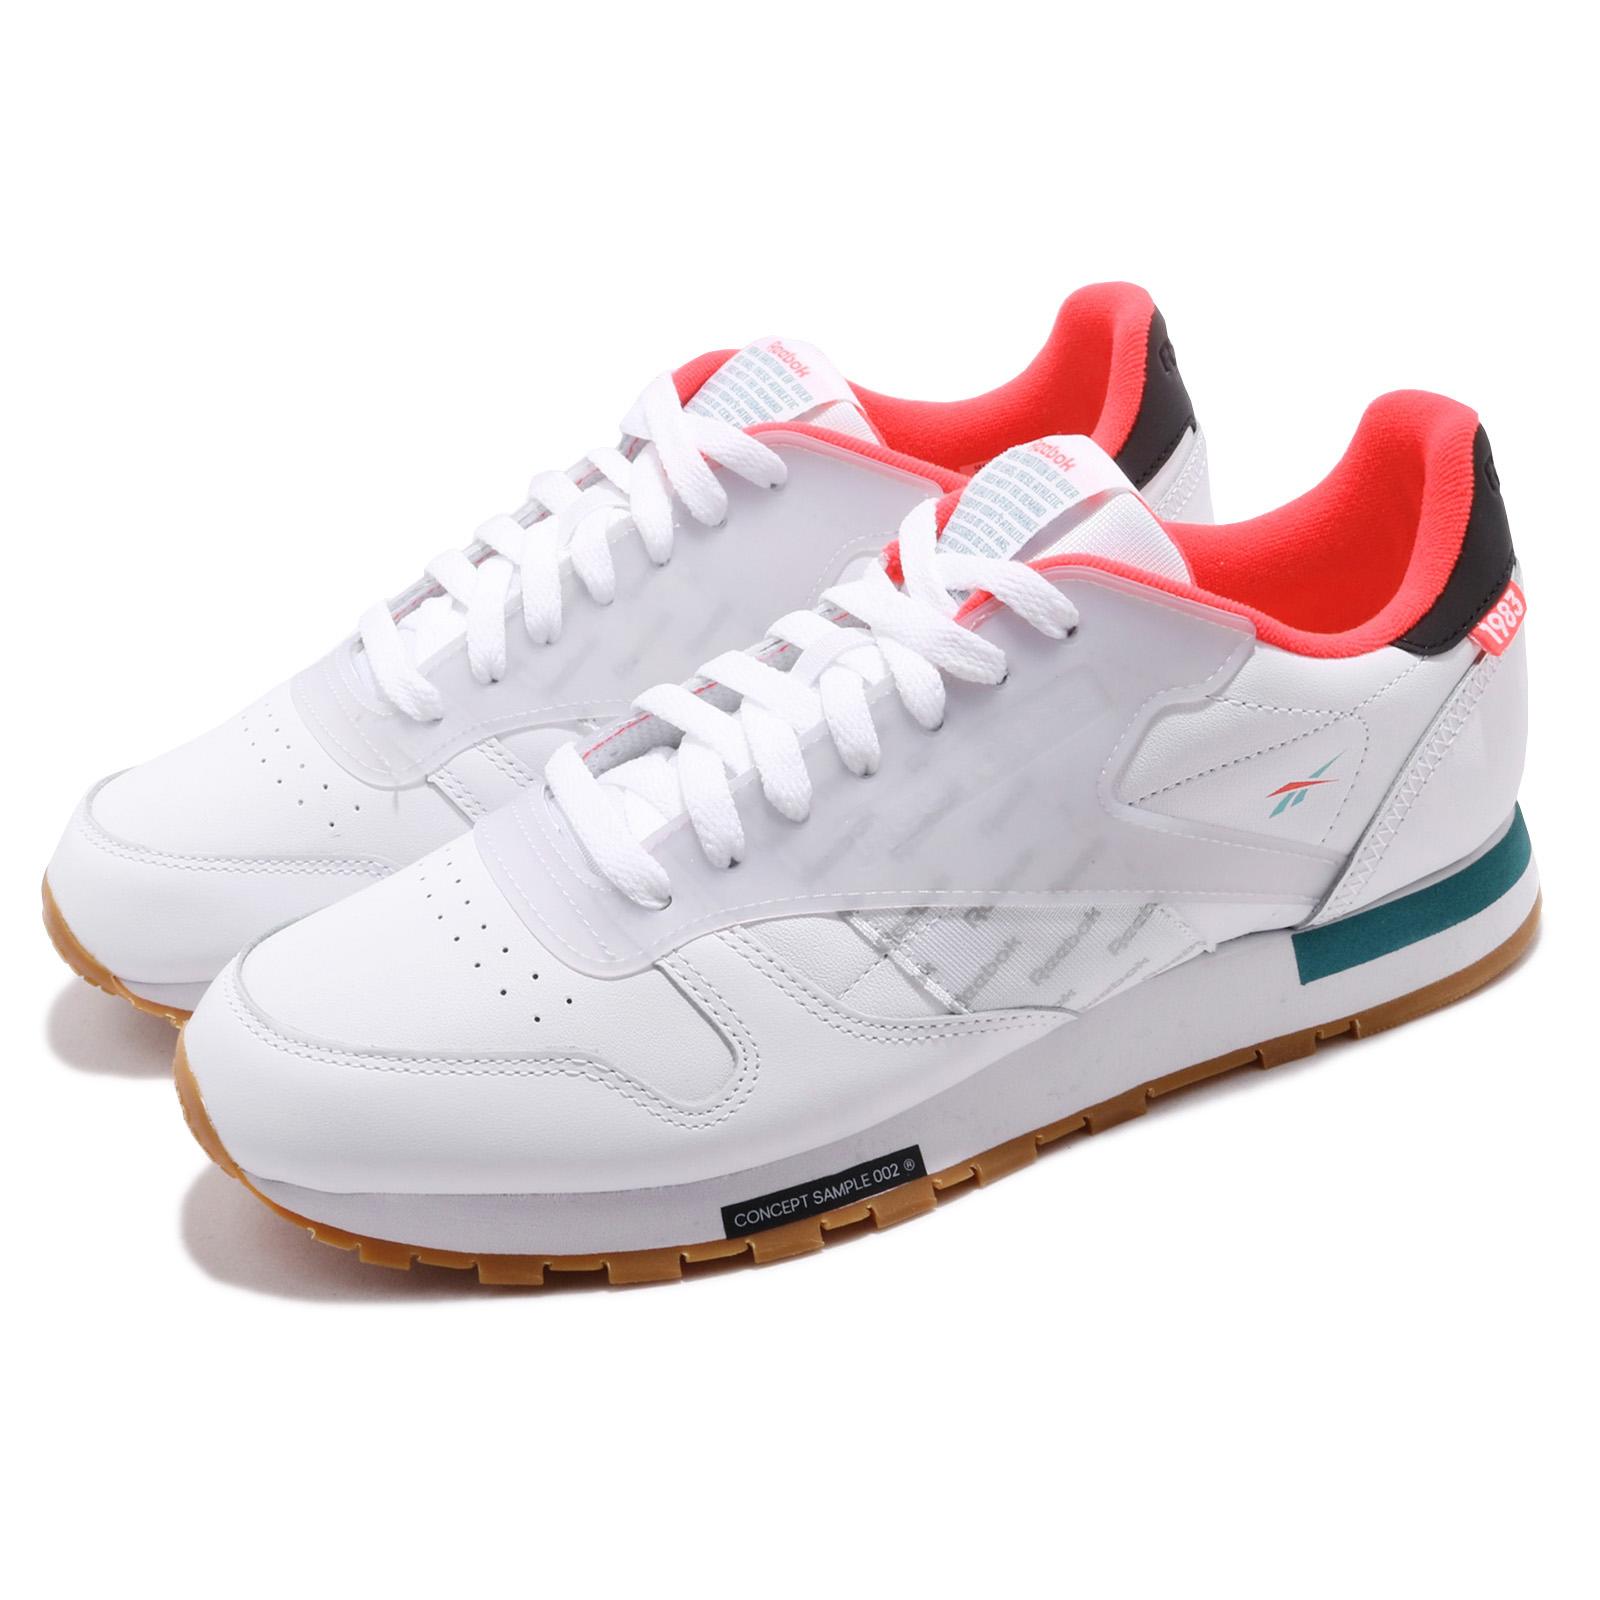 Reebok 休閒鞋 CL Leather ATI 運動 男鞋 DV5239